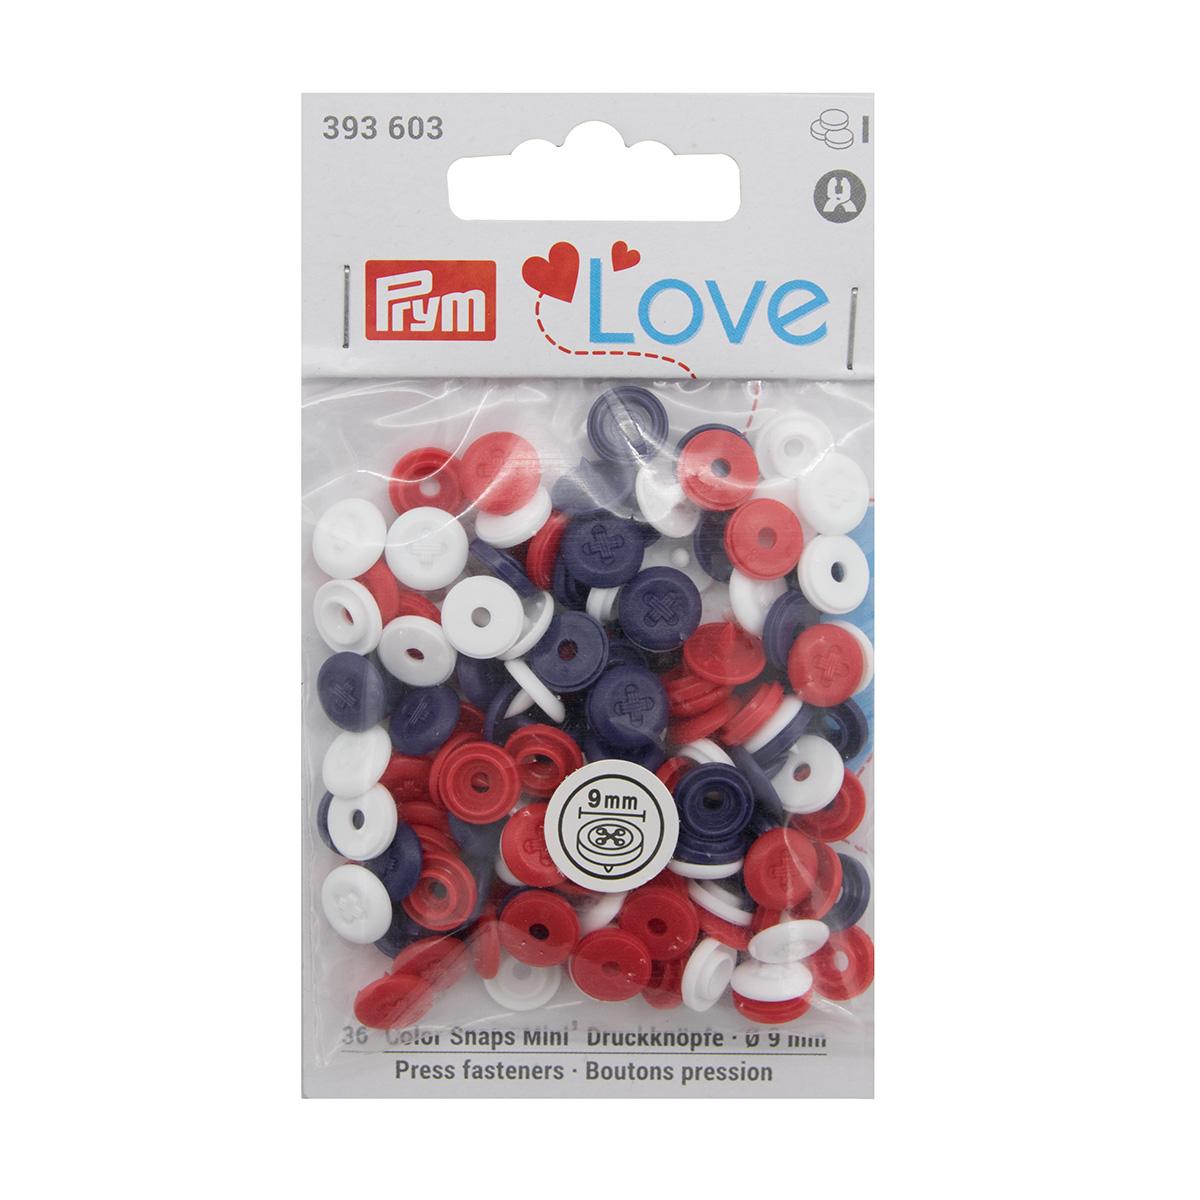 393603 Кнопки ColorSnapsMini имитация стежка Prym Love, красн/бел/син 36шт Prym